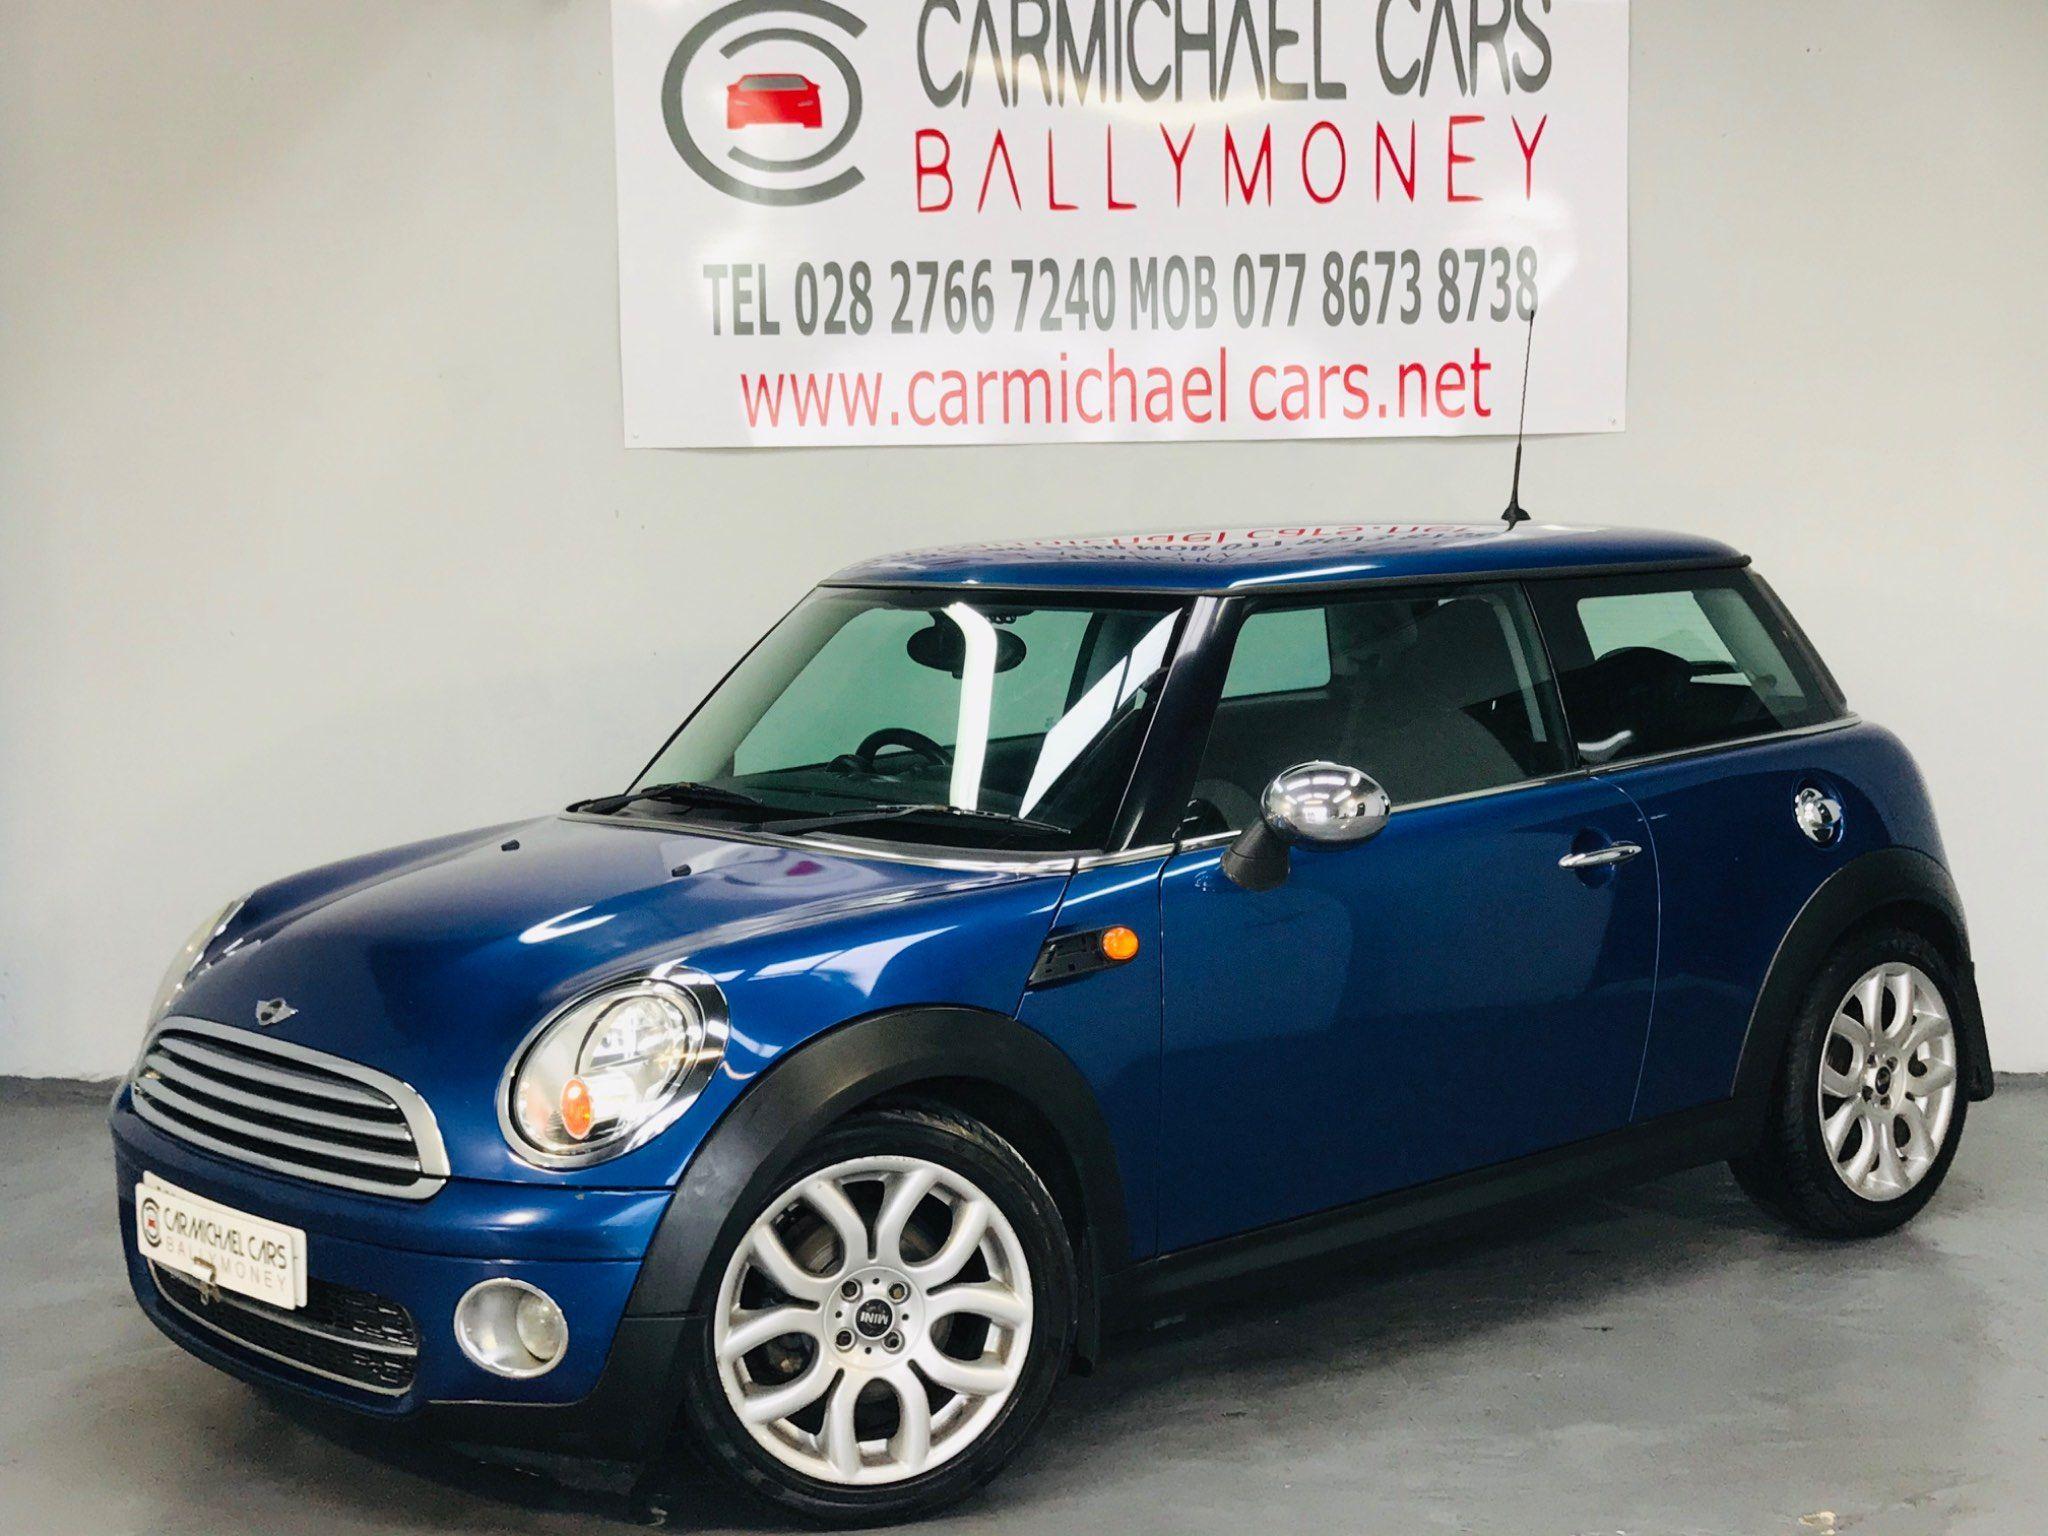 2008 MINI Hatch 1.6 Cooper D Diesel Manual BLUE, 106K, 1/2 LEATHER – Carmichael Cars Ballymoney full